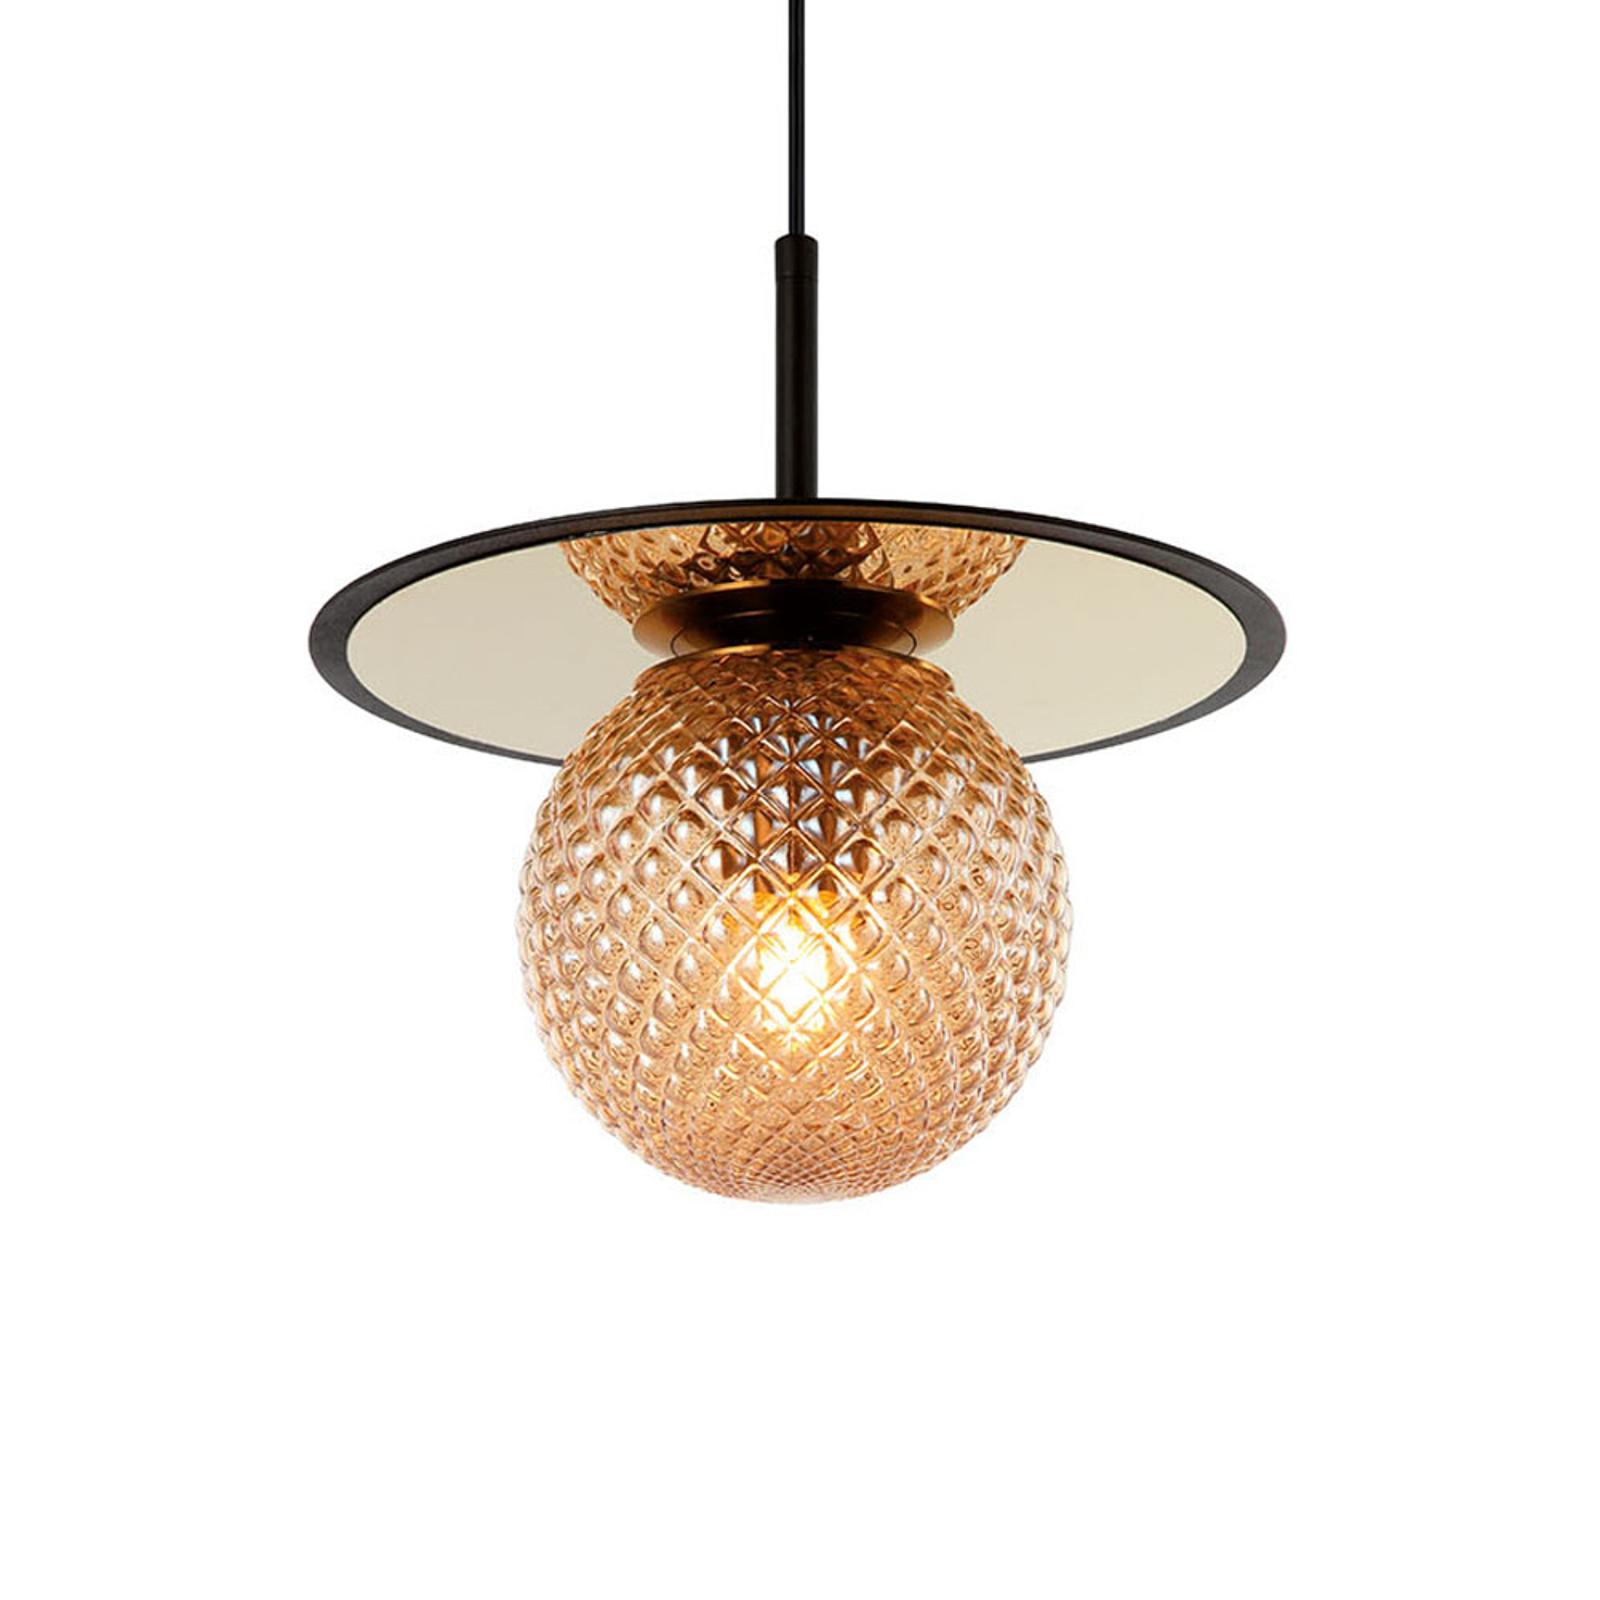 Hanglamp Cairo van glas, amber